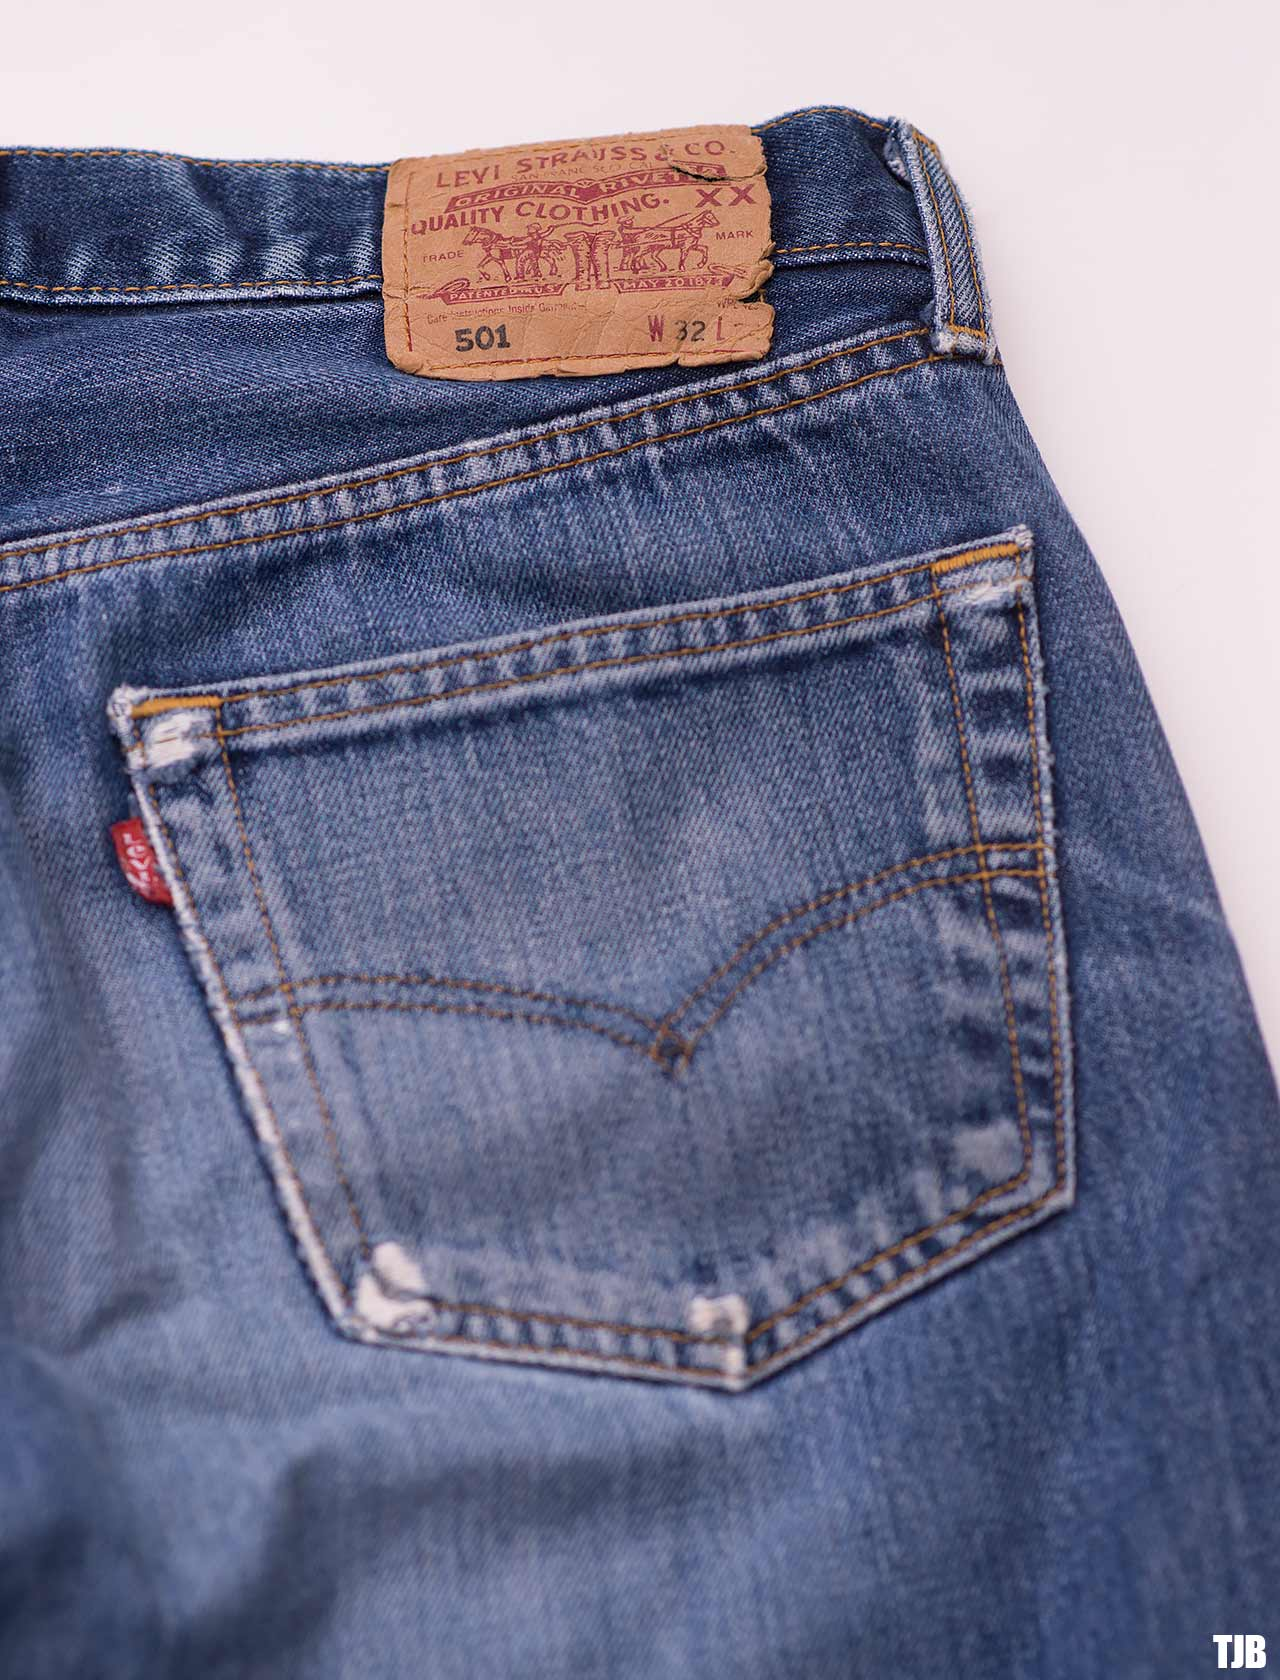 vintage-levis-501-raw-amazing-wash-jeans-6